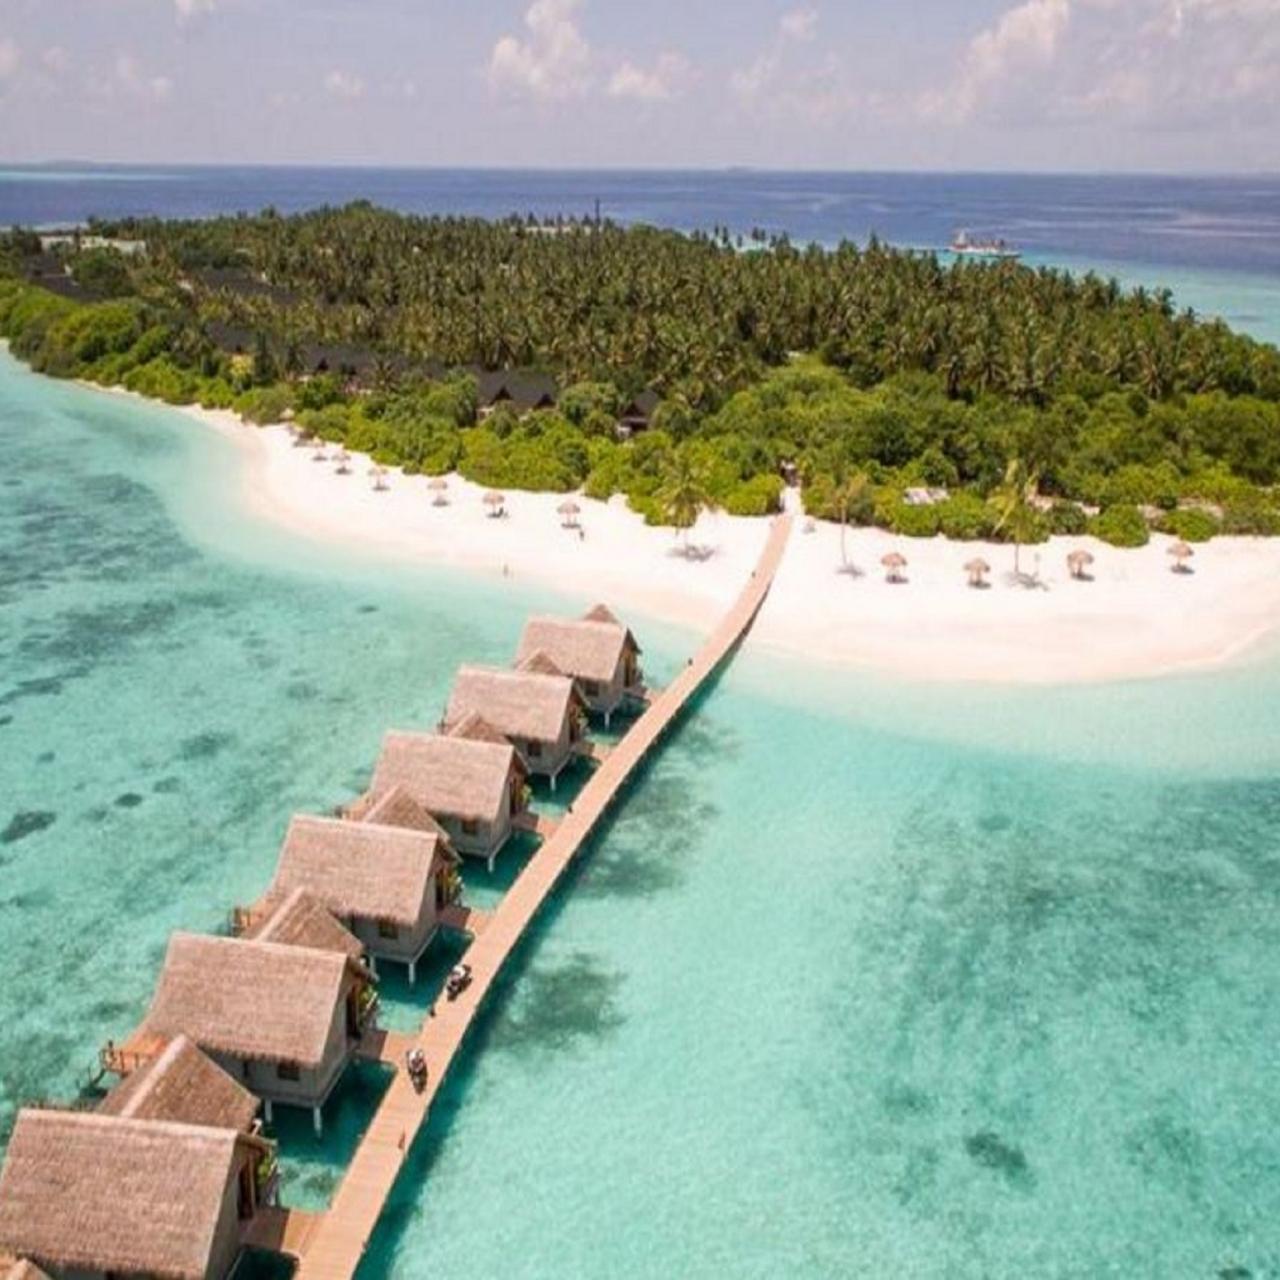 Malediven: 5*Furaveri Island Resort & Spa - 5 Nächte & 2 Personen inkl. Frühstück & Extras / bis Dezember 2022 / gratis Storno